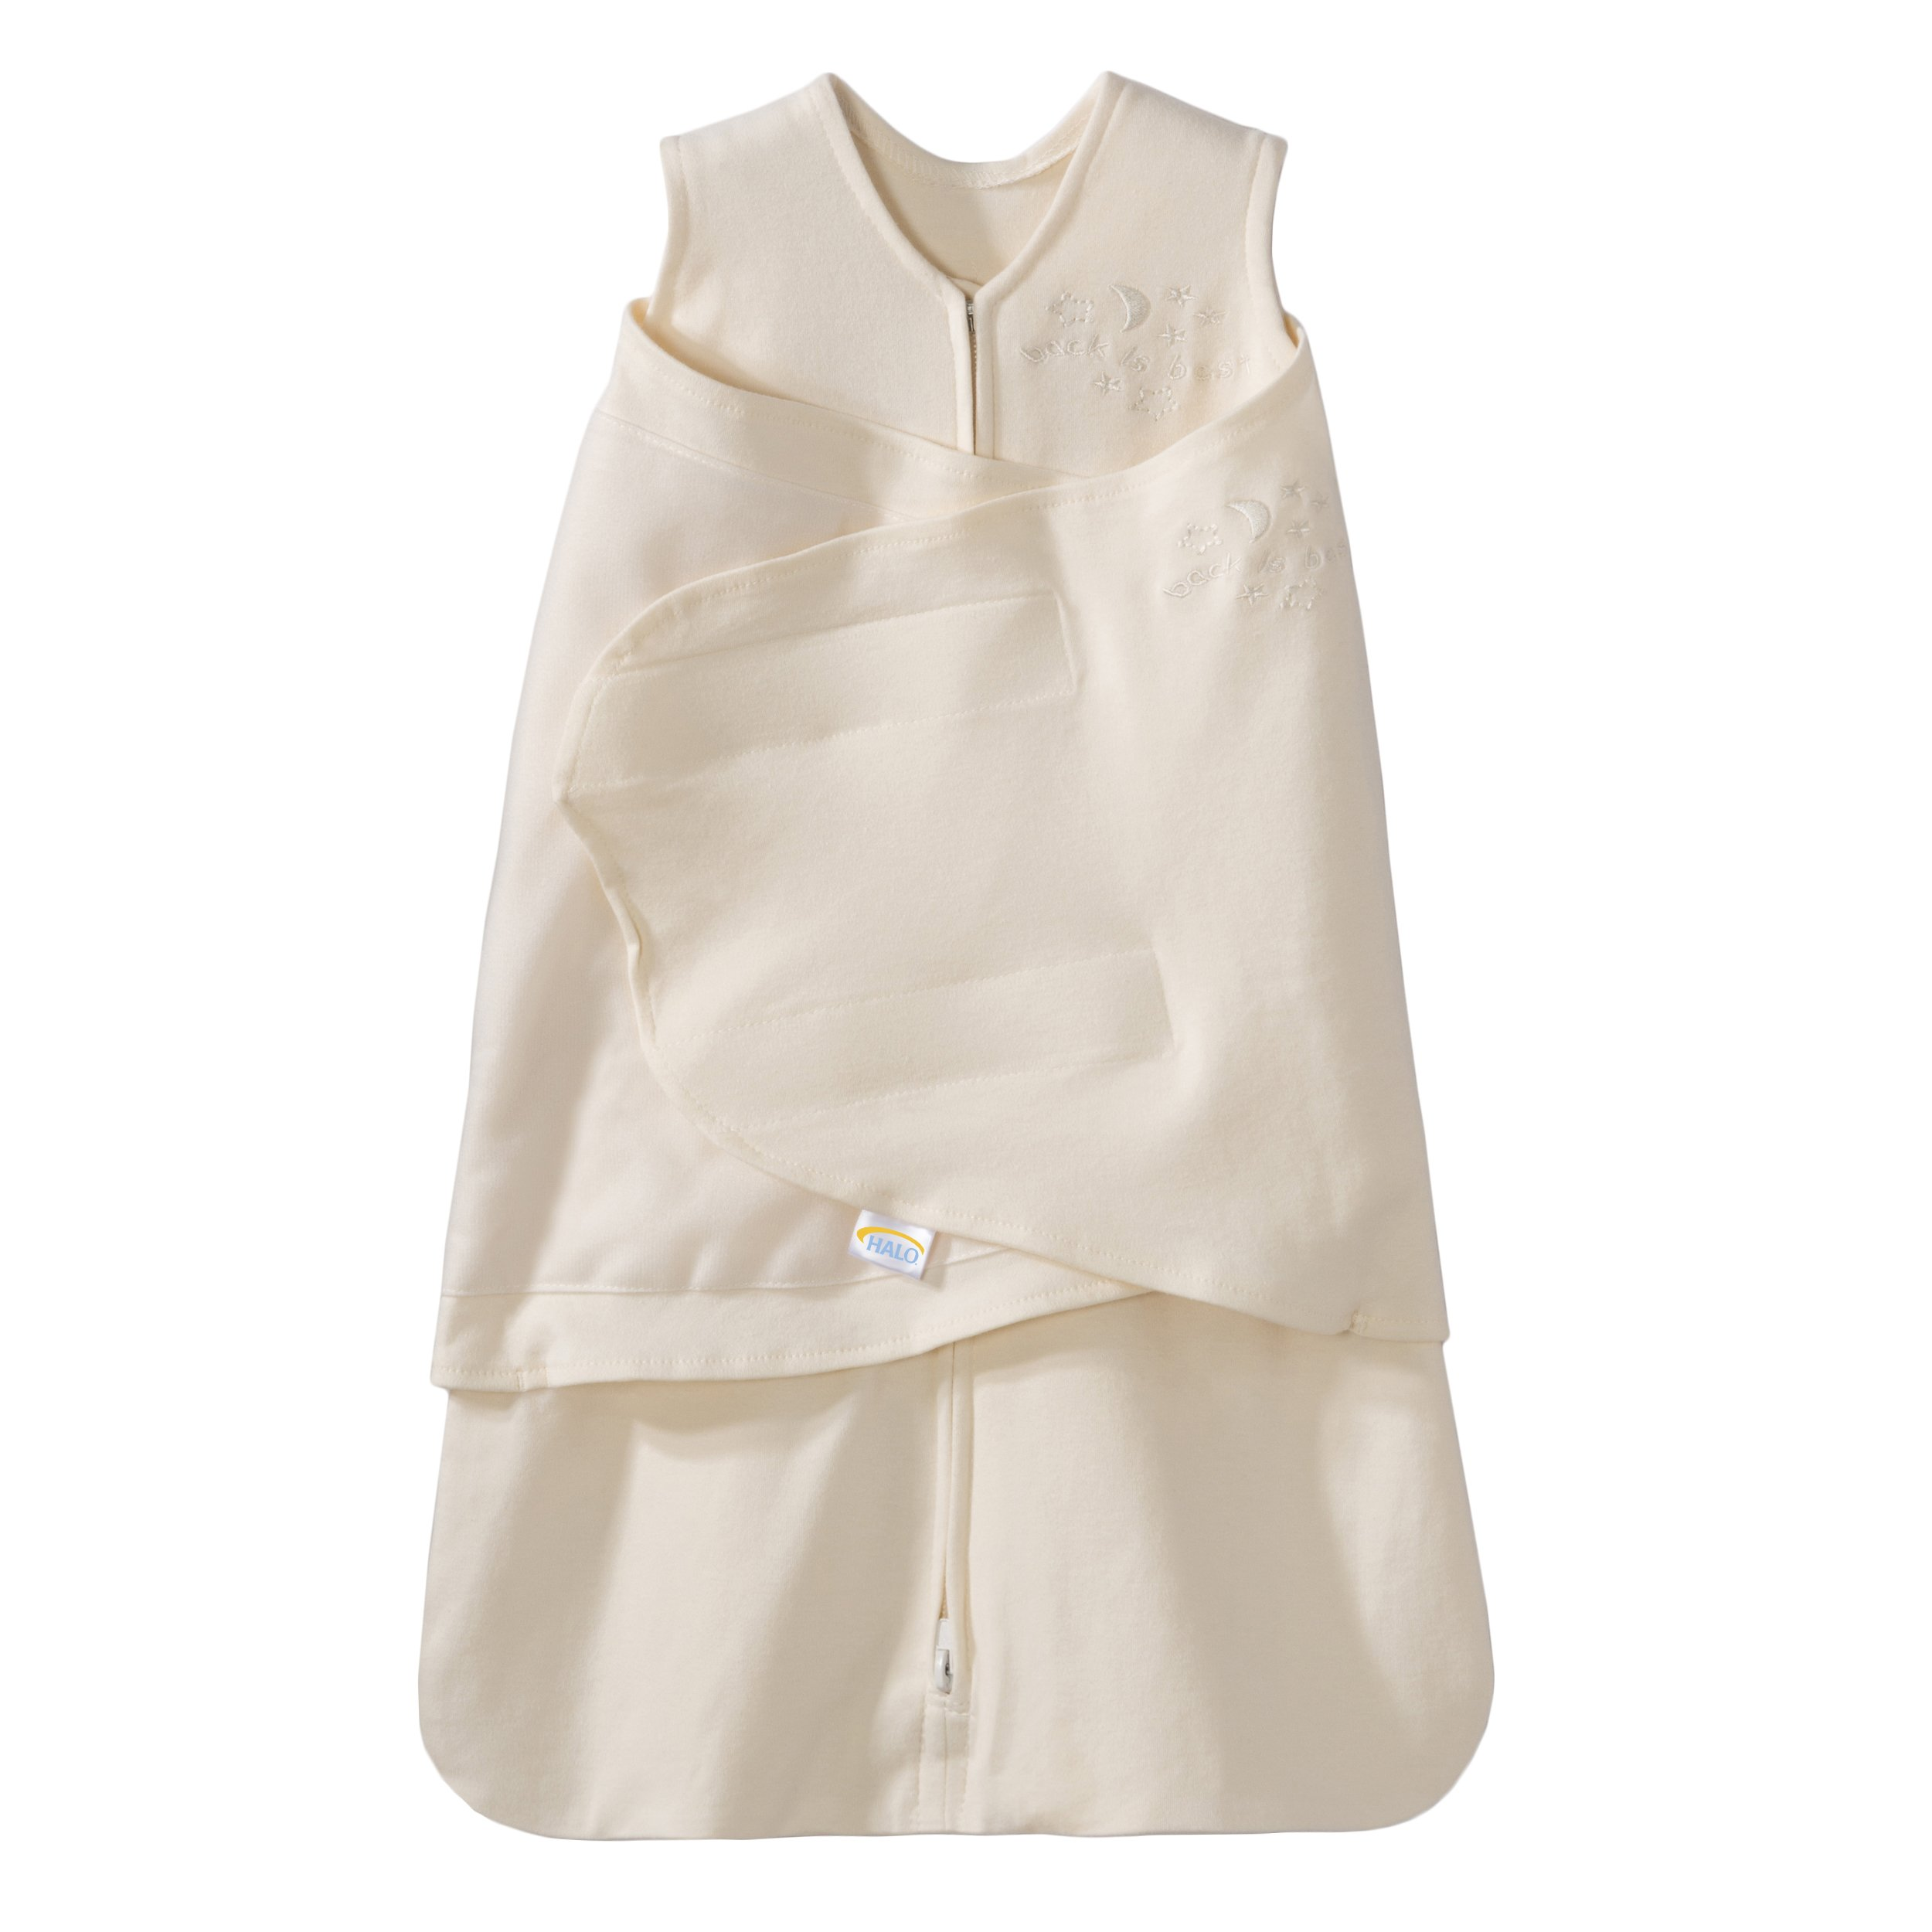 HALO Sleepsack 100% Cotton Swaddle, Cream, Small by Halo